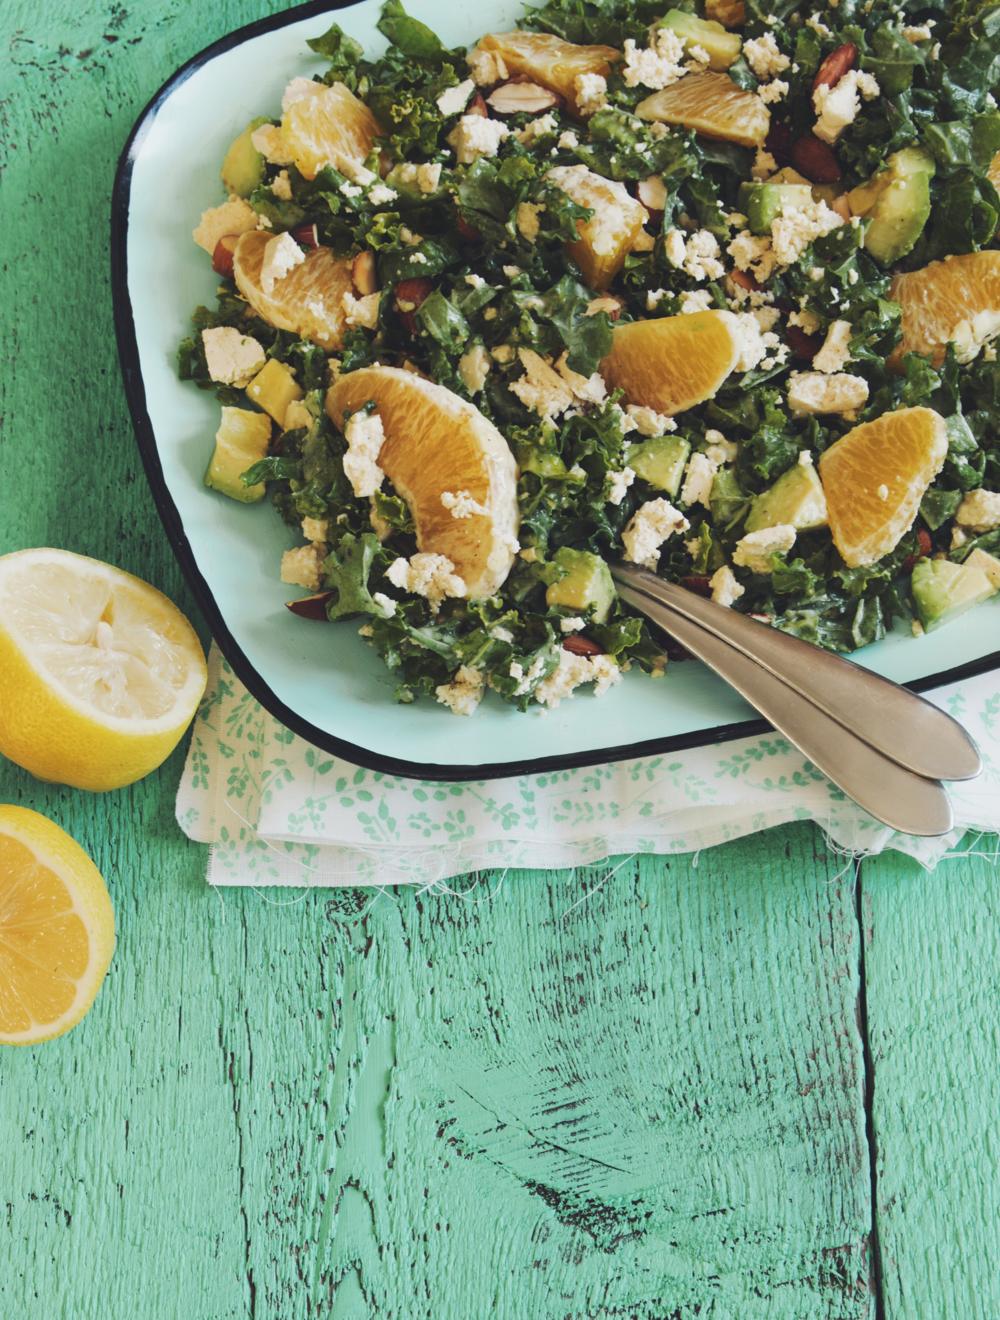 citrus, kale & avocado salad #vegan version of 2015 Milk Calendar | RECIPE on hotforfoodblog.com